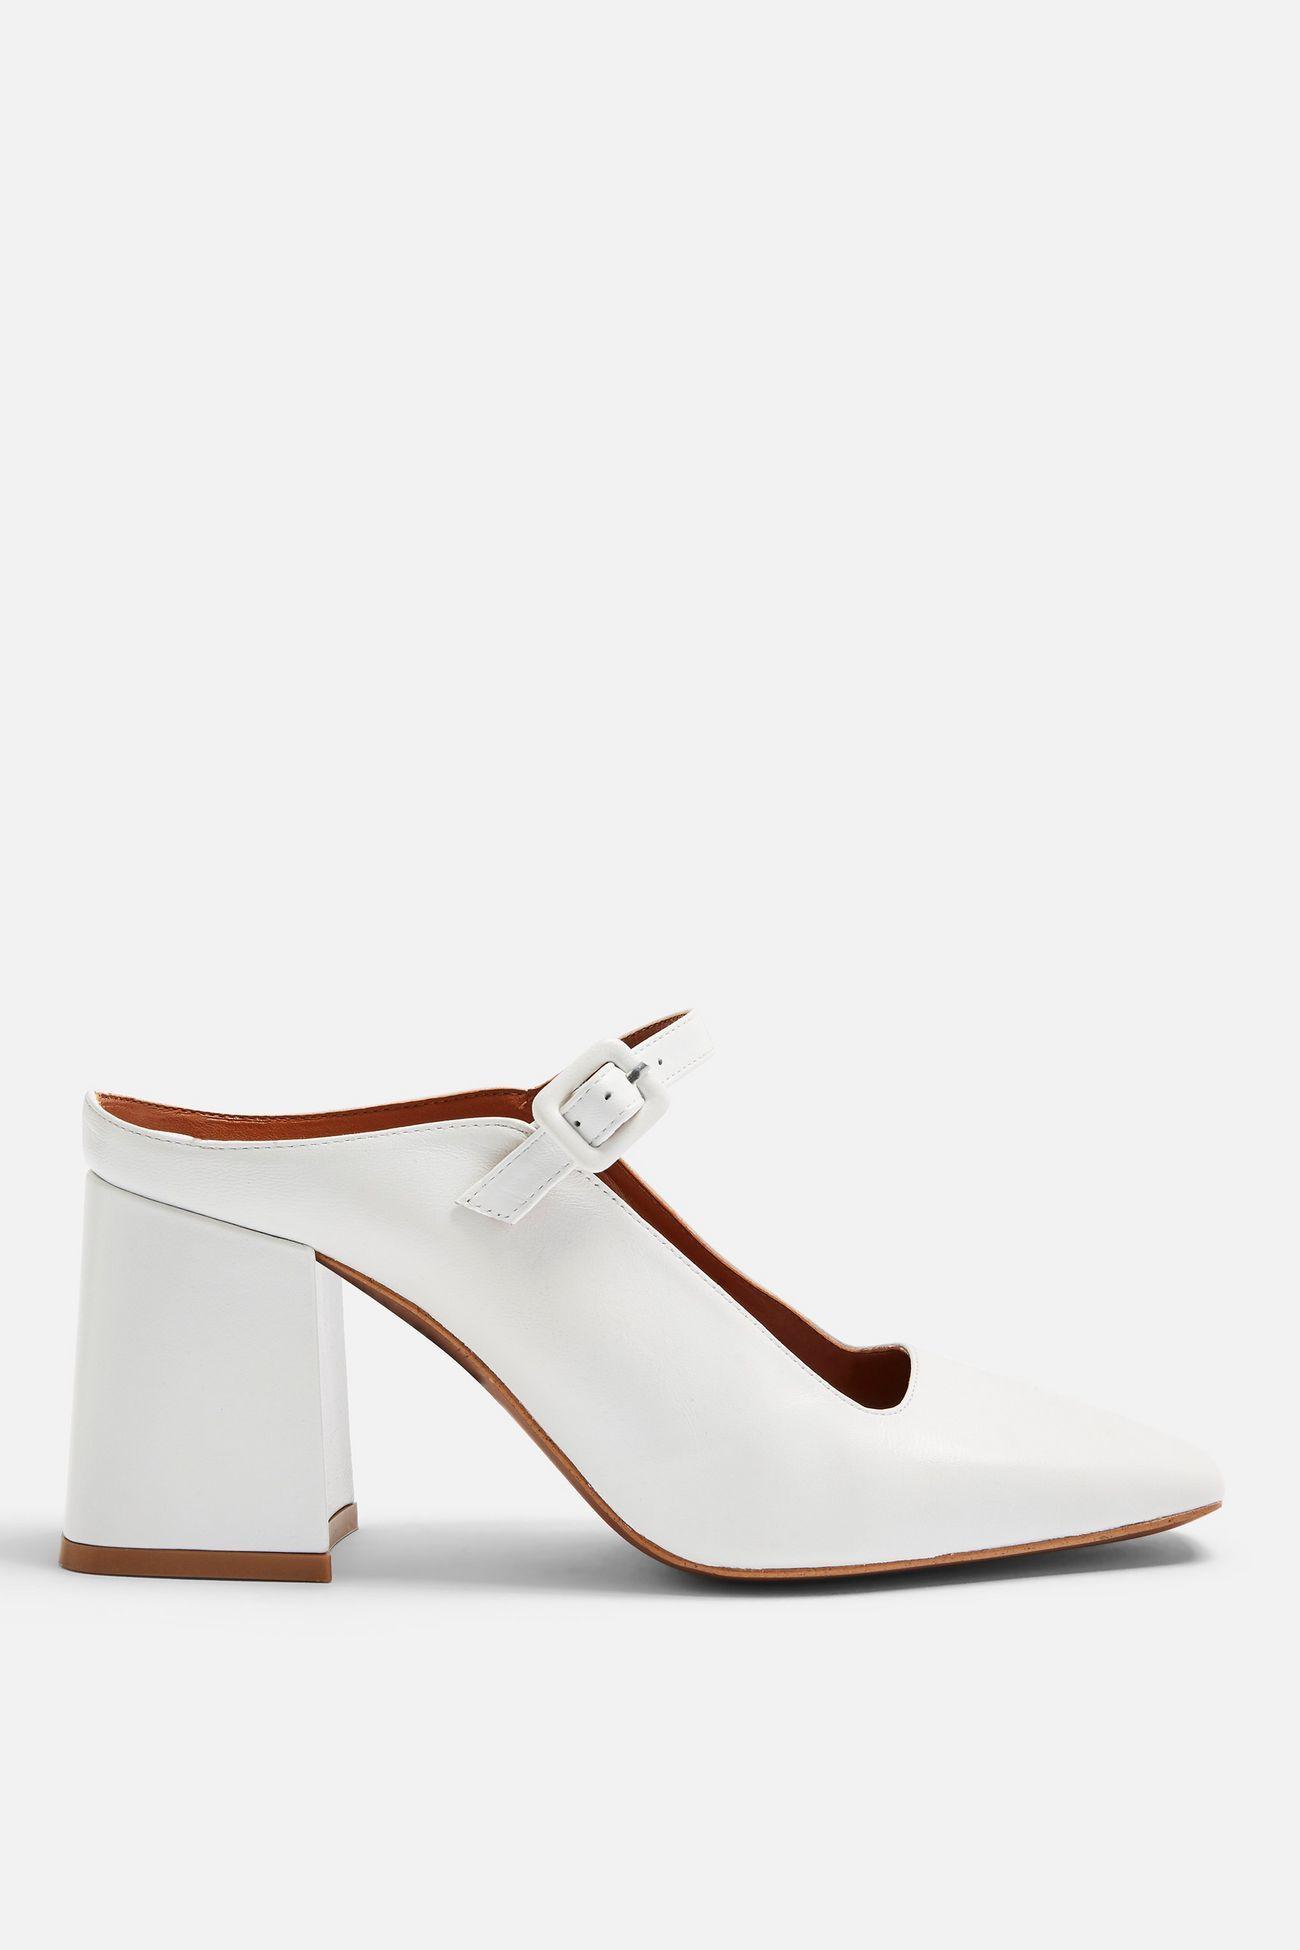 Assorted shoes converse fashion nova and BKE denim style shoes.